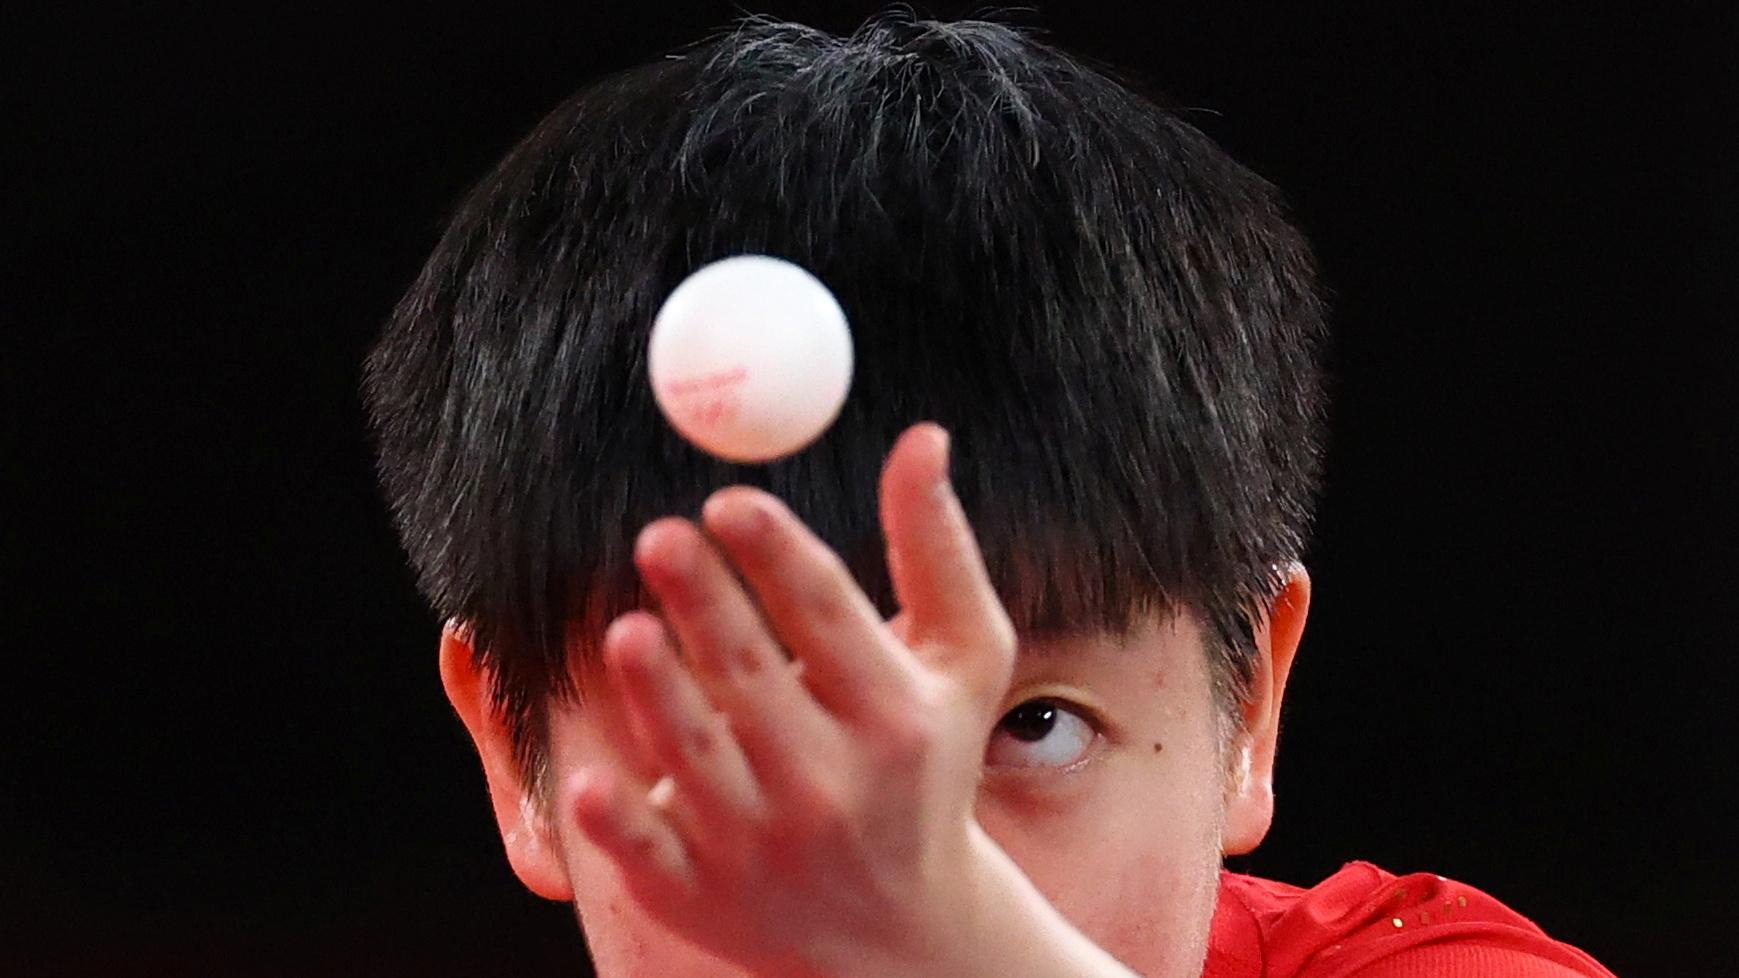 Tokyo 2020 Olympics - Table Tennis - Women's Team - Semifinal - Tokyo Metropolitan Gymnasium - Tokyo, Japan - August 4, 2021. Sun Yingsha of China in action against Ying Han of Germany. REUTERS/Thomas Peter - RC22YO9HC2QK